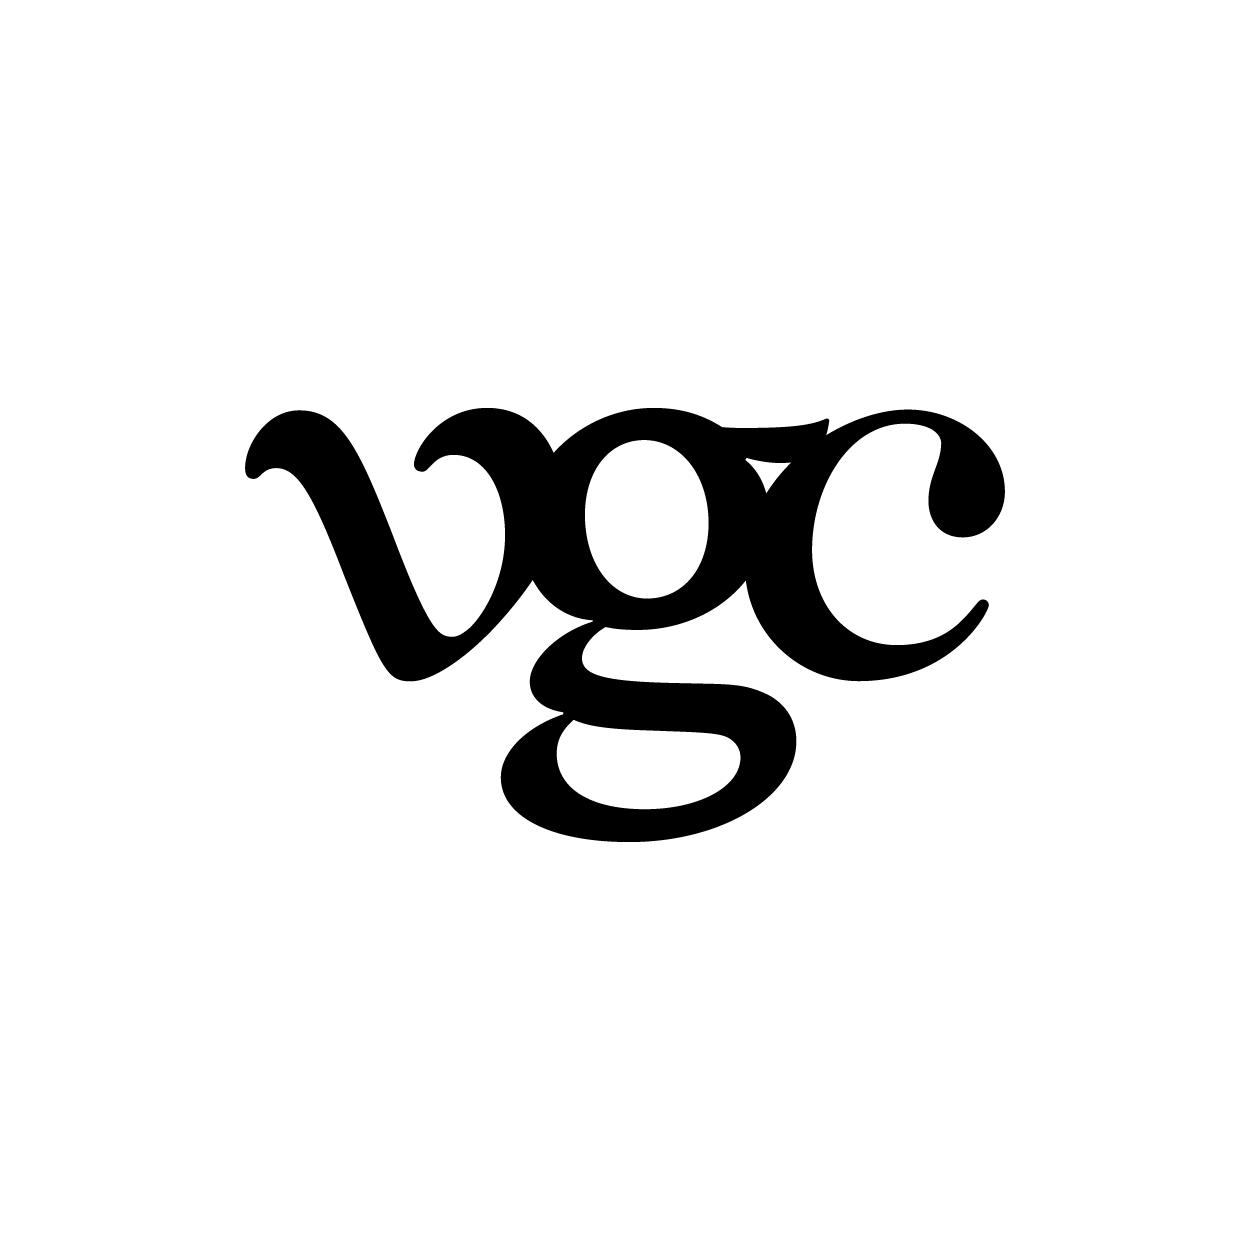 vgc_victorgc.png